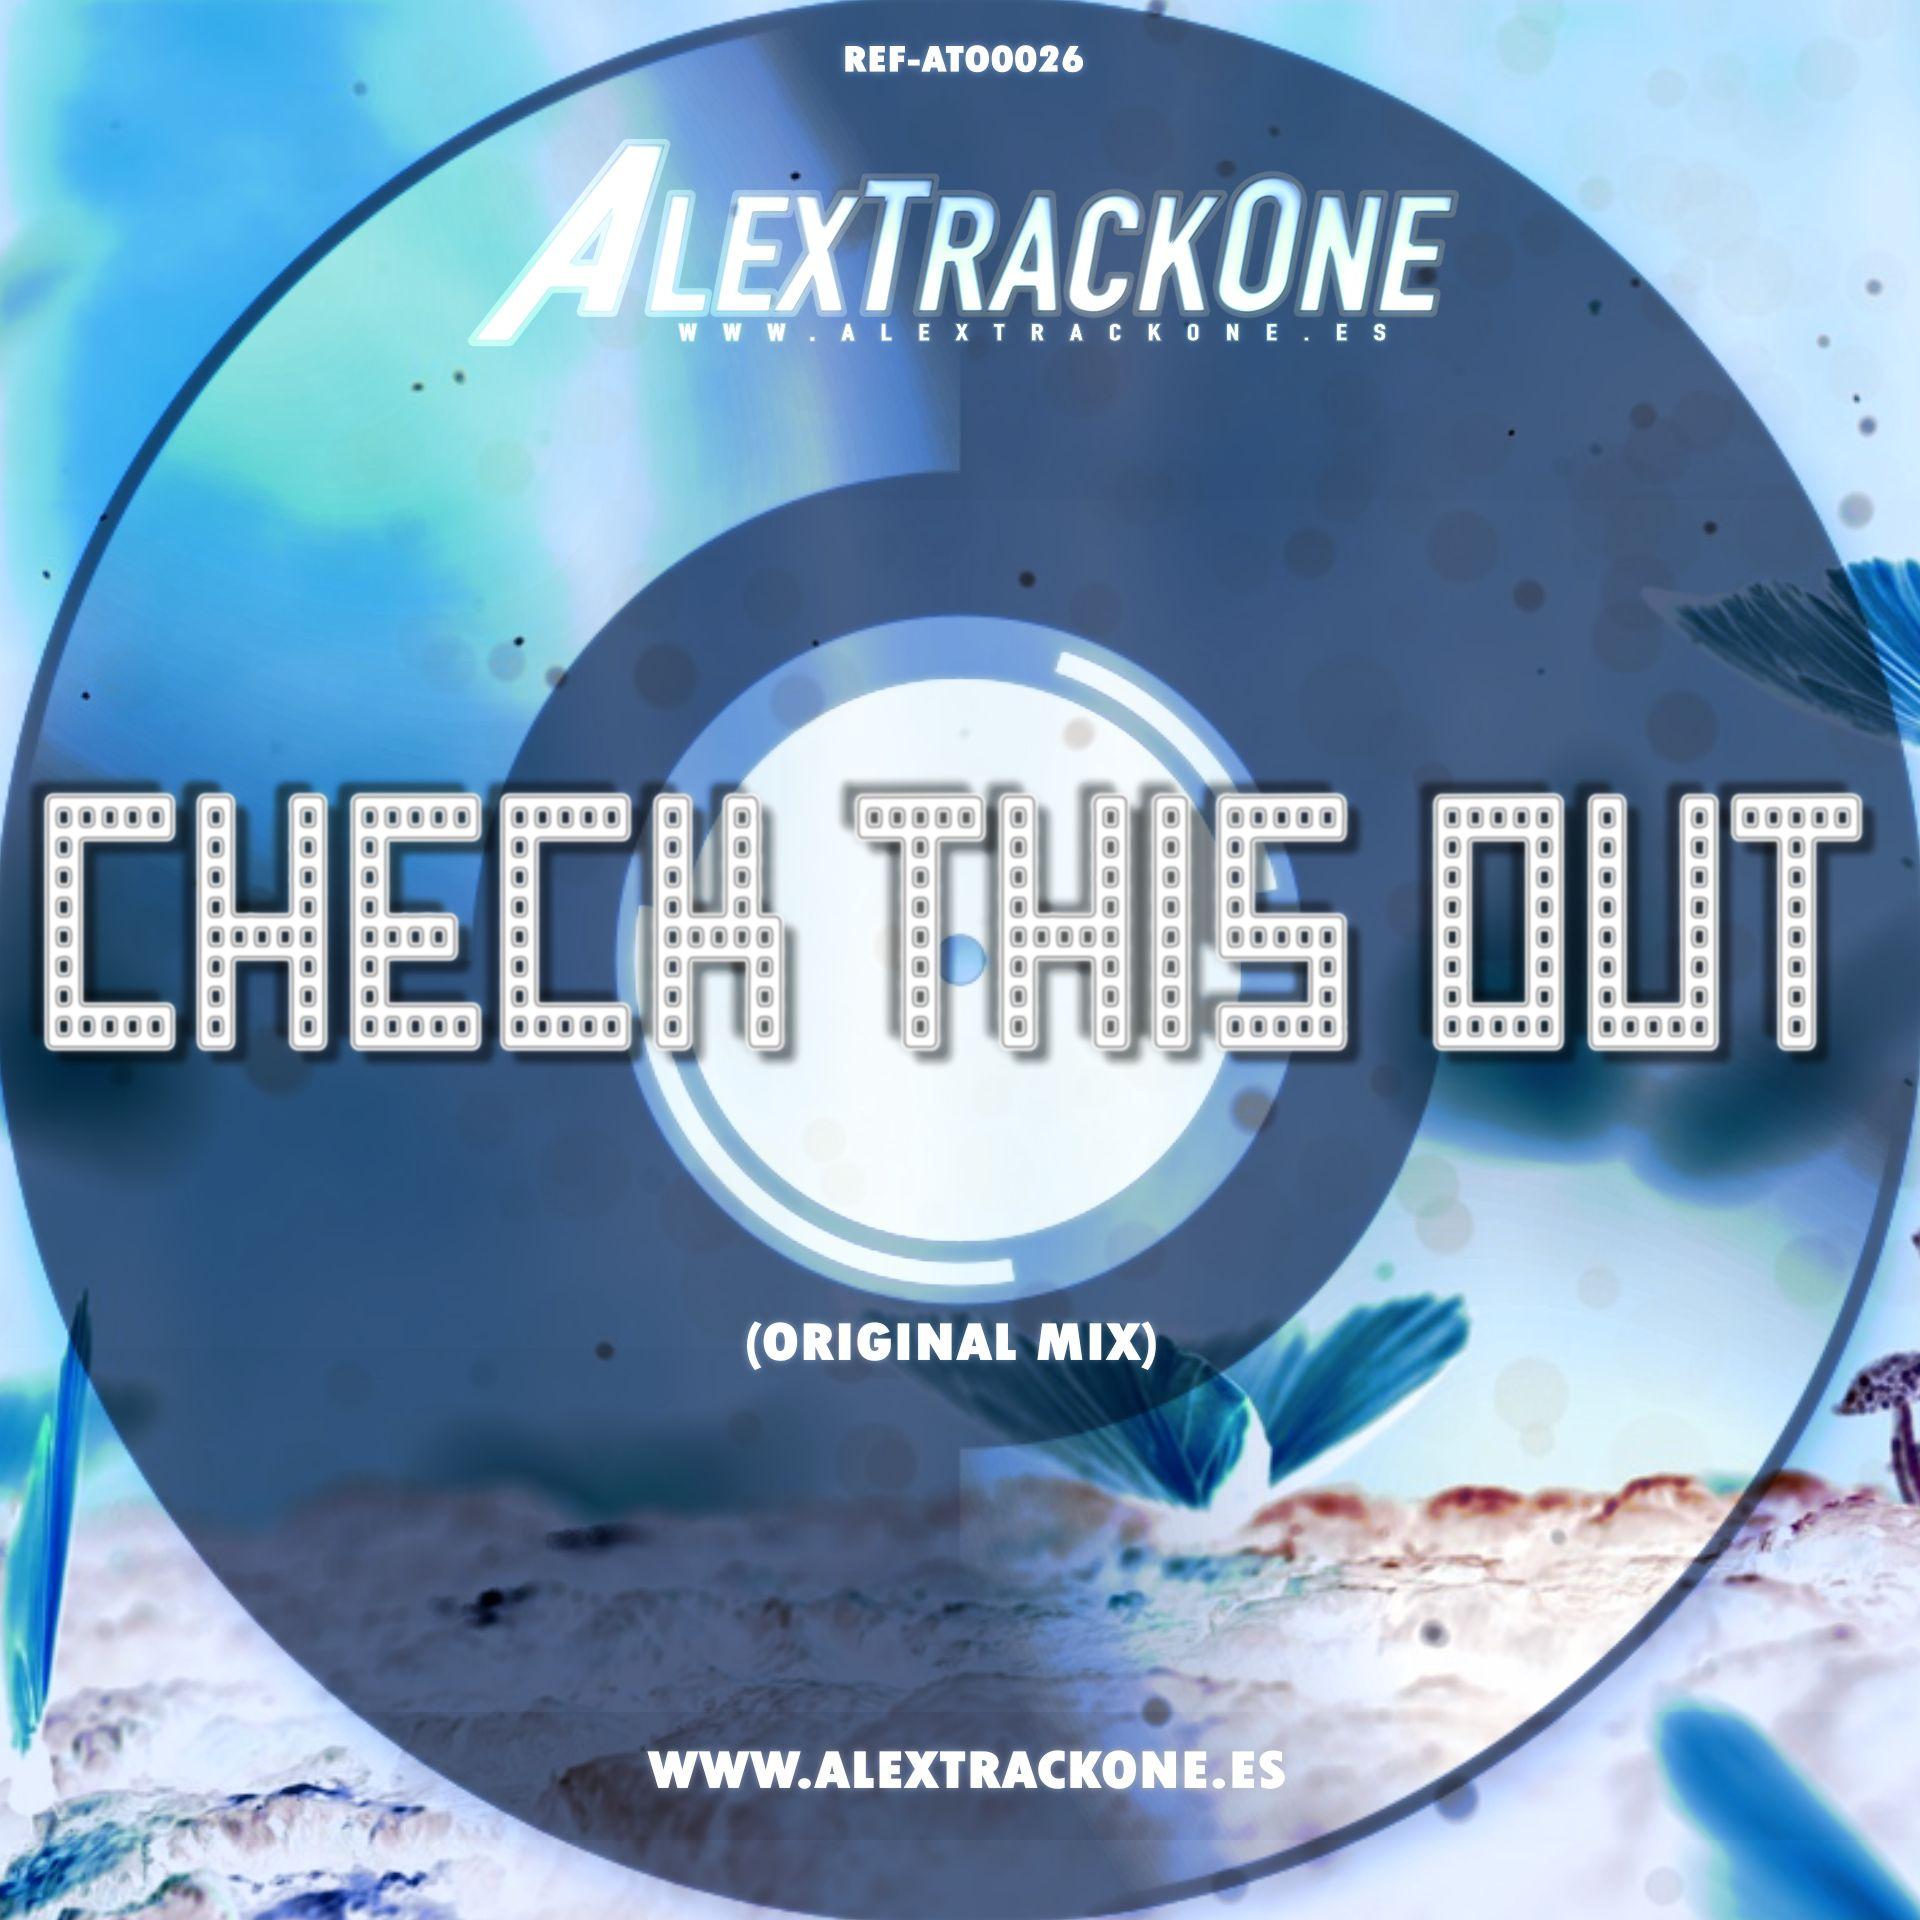 REF-ATO0026 CHECK THIS OUT (ORIGINAL MIX) (MP3 & WAV)